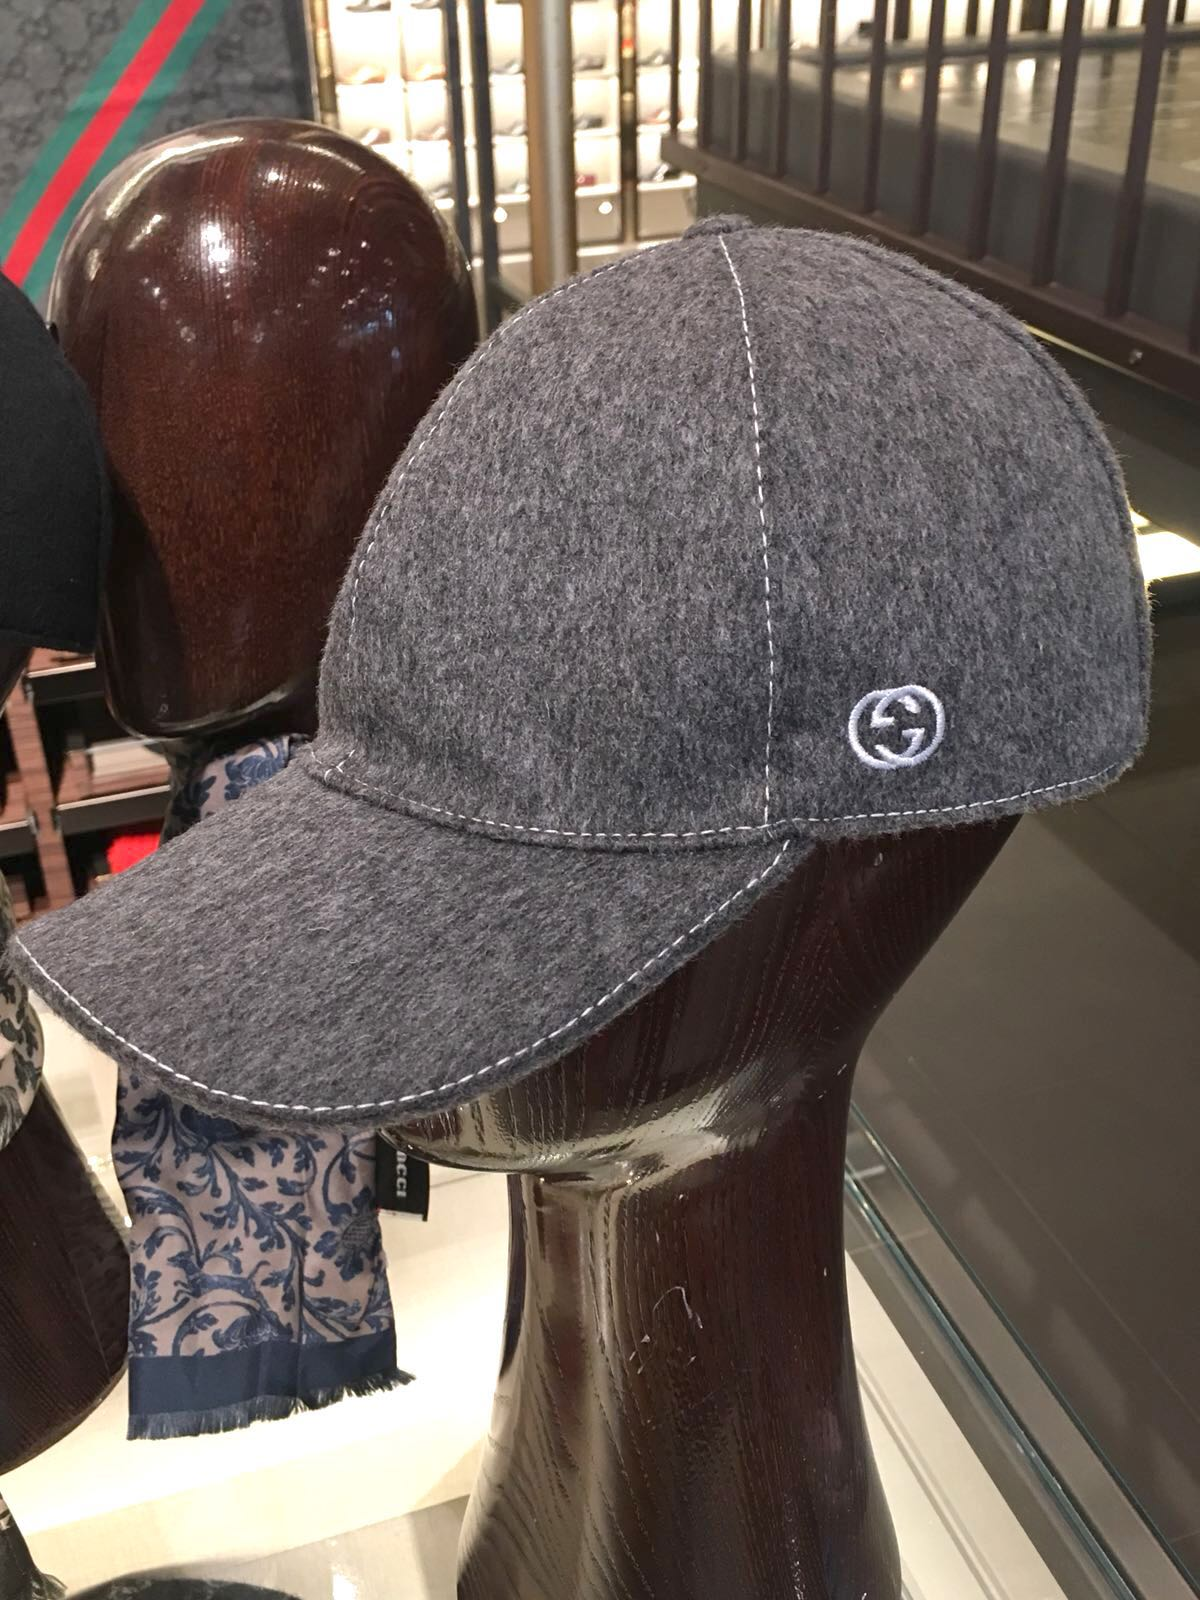 85e1de75e11c96 Gucci Baseball Cap Sizes